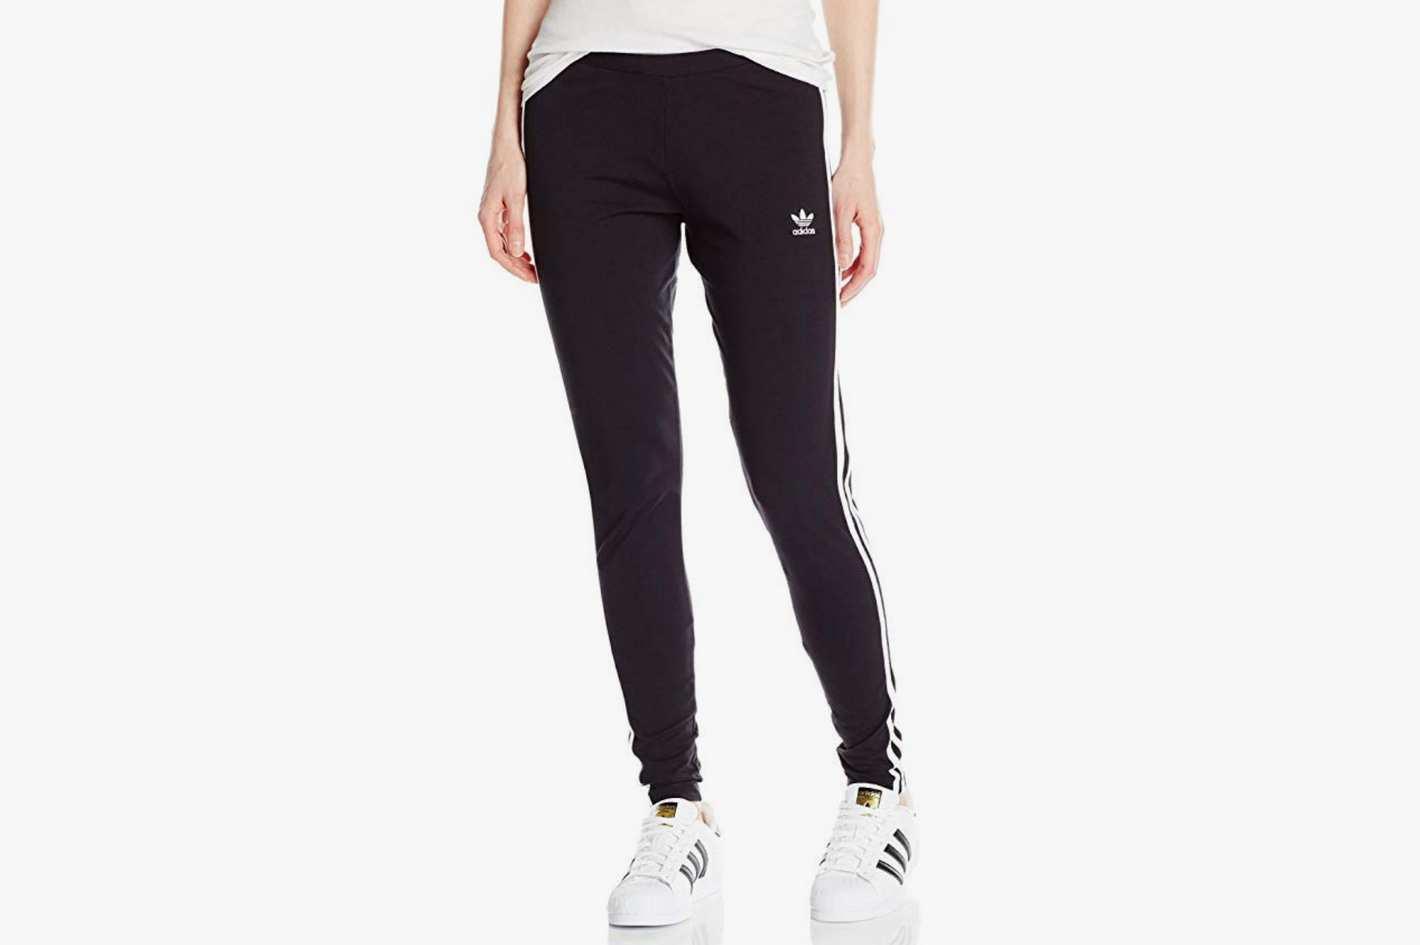 adidas 3-Stripes Legging